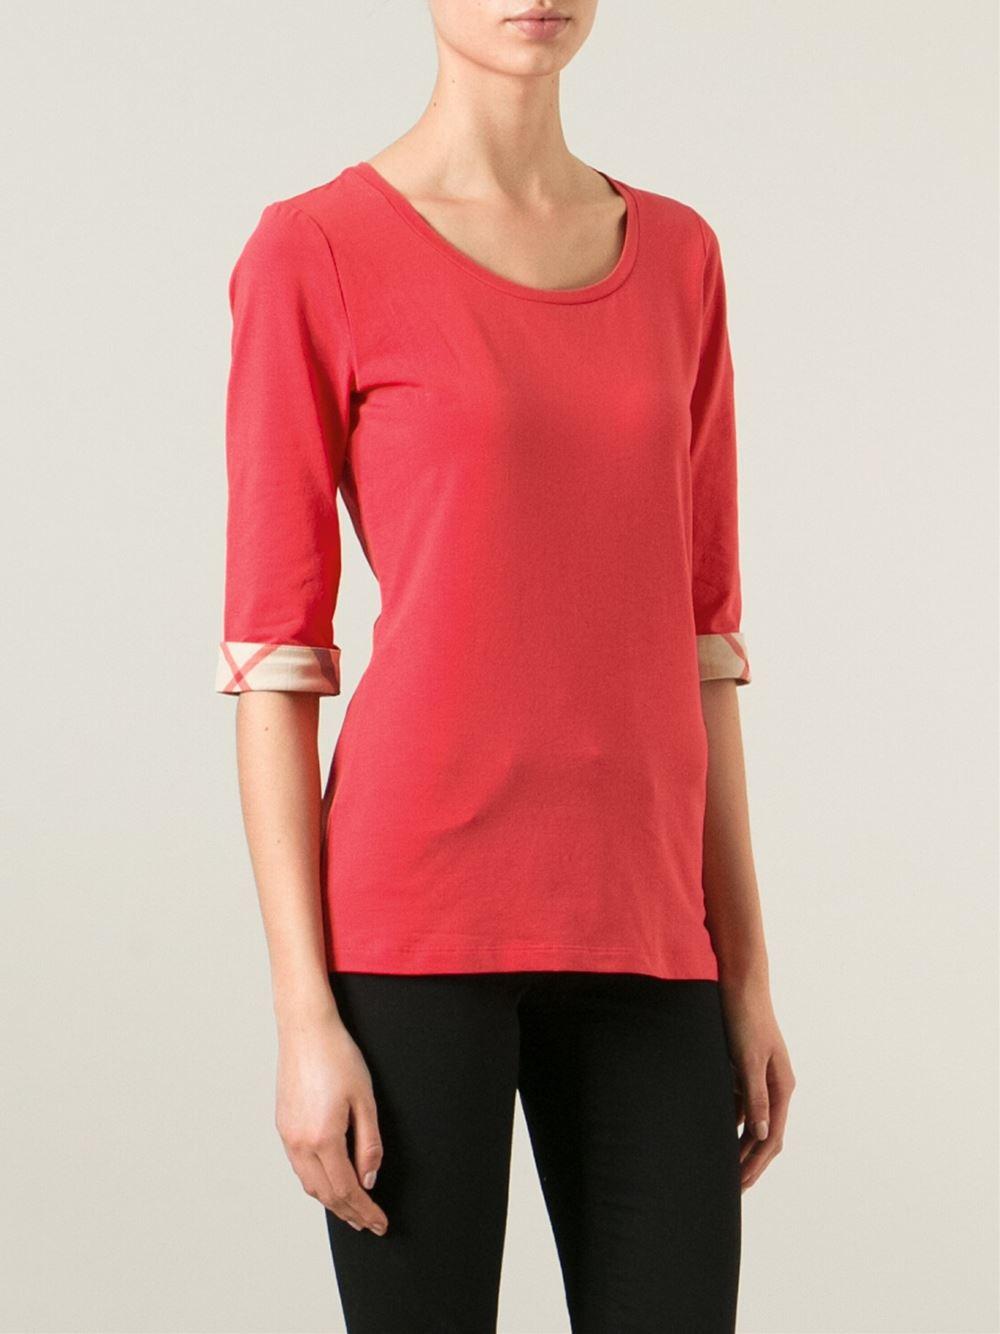 Burberry brit three quarter length sleeve t shirt in pink for Three quarter length shirt